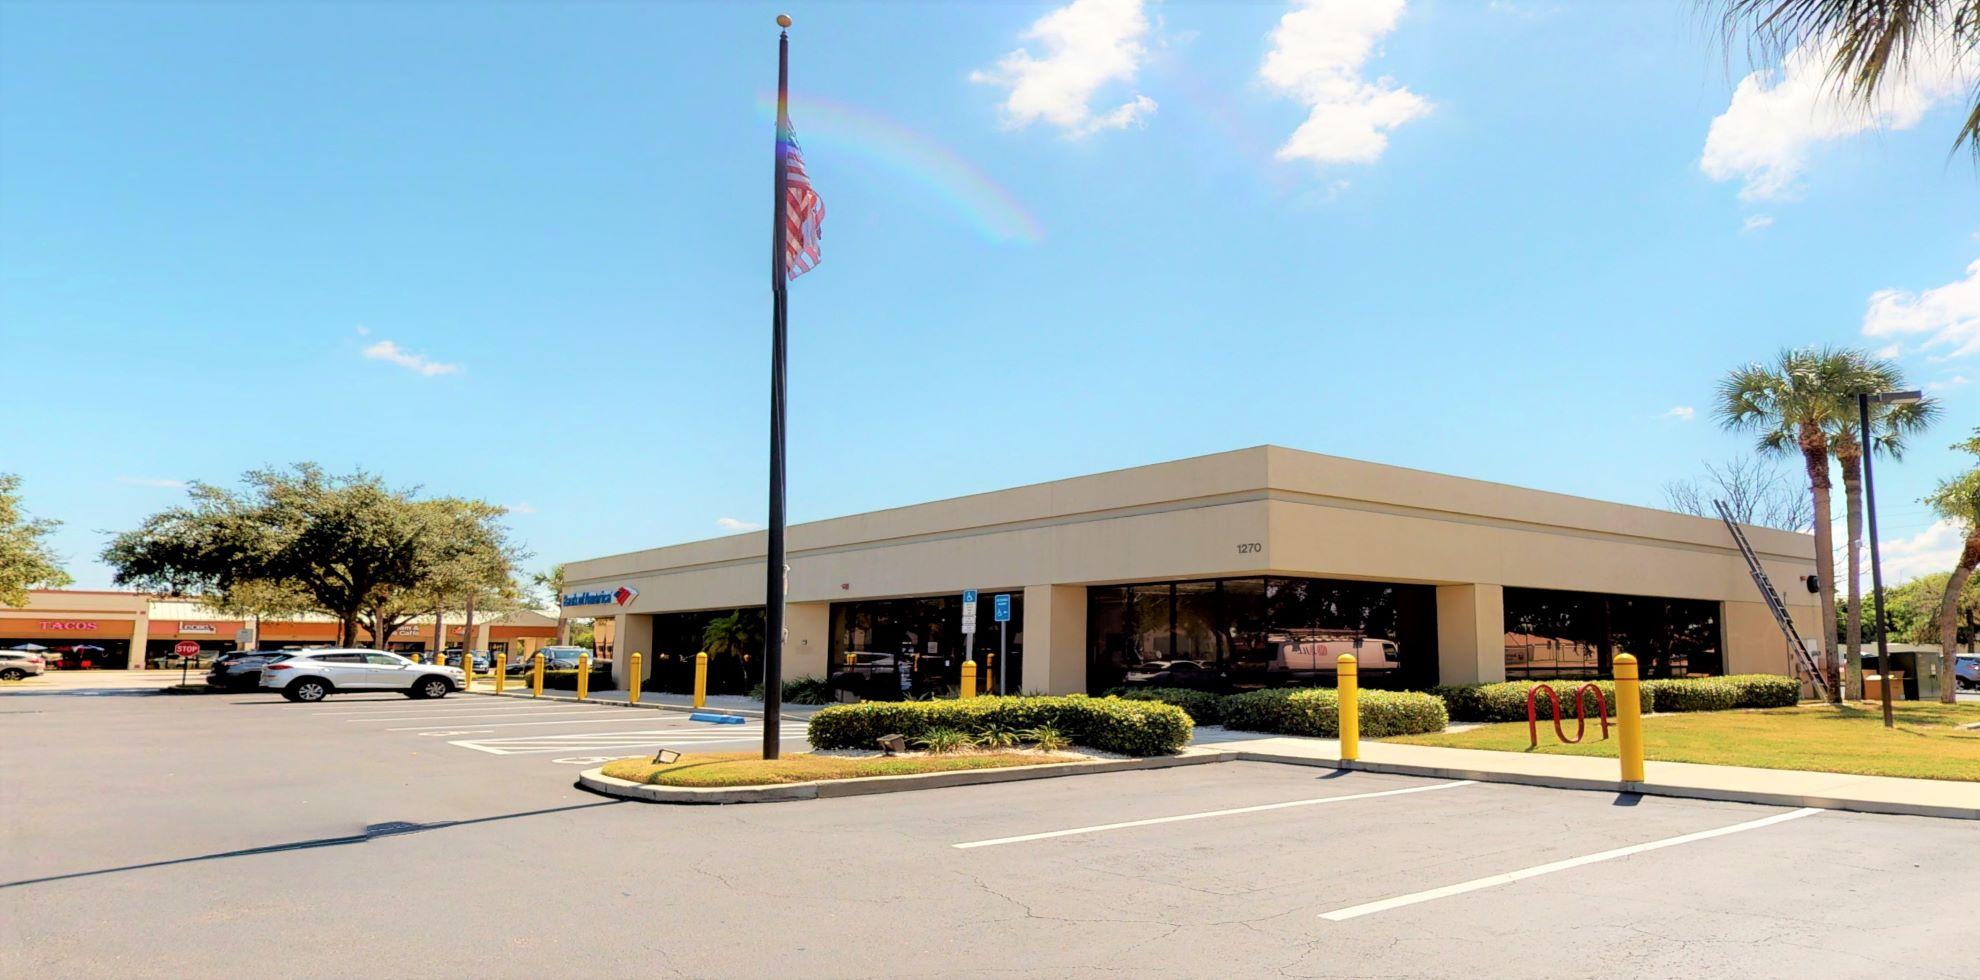 Bank of America financial center with drive-thru ATM   1270 Jacaranda Blvd, Venice, FL 34292